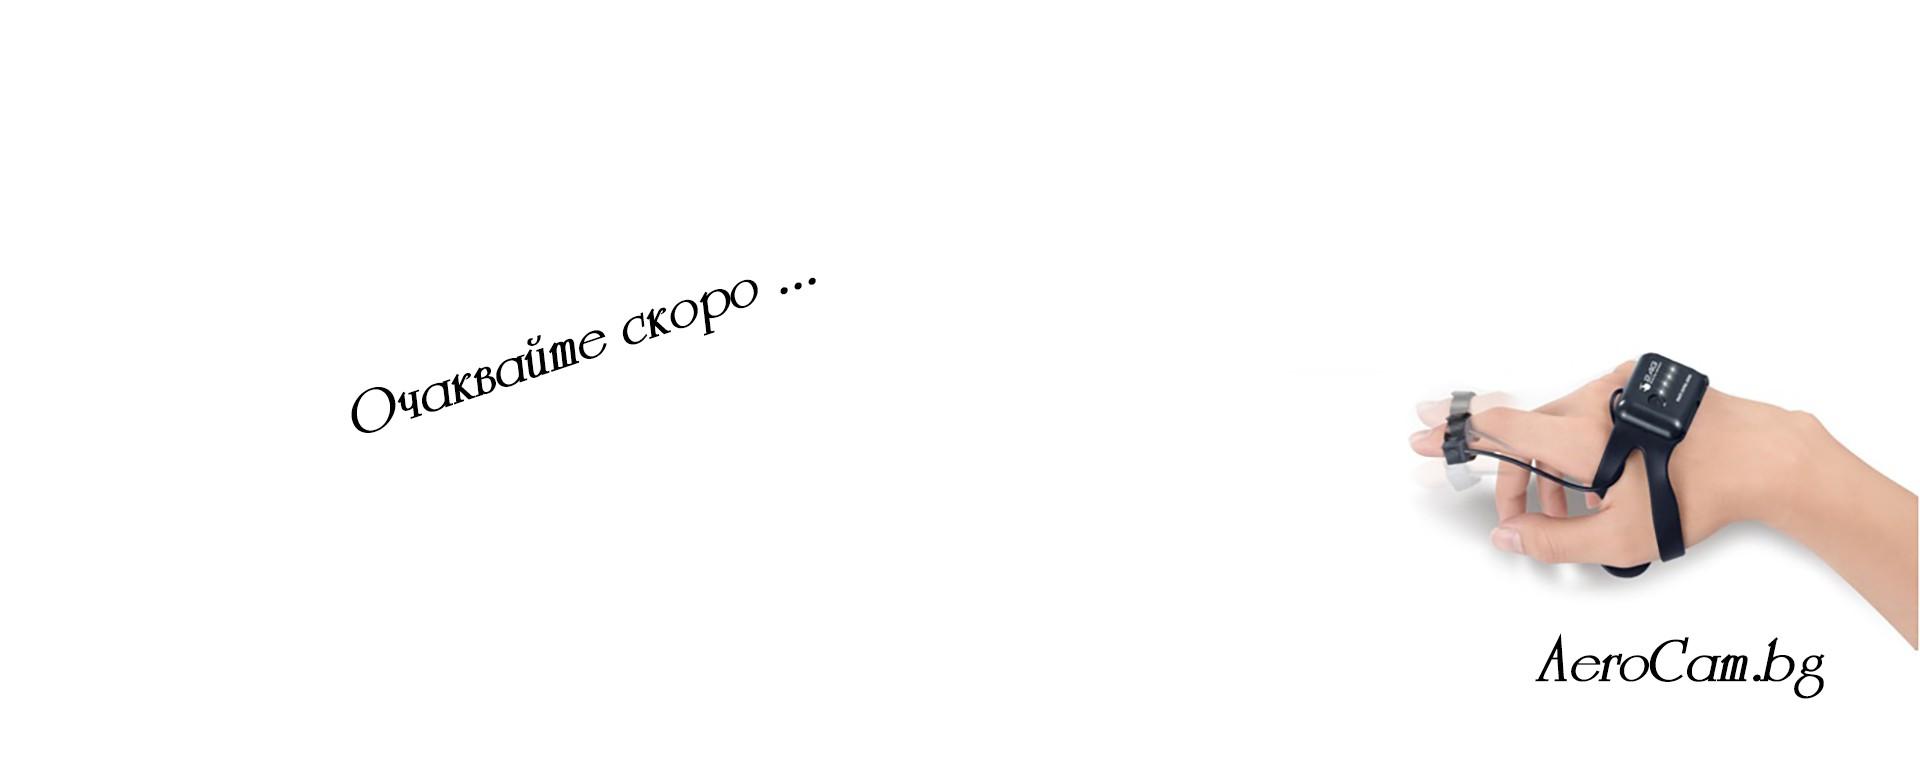 Drone | AeroCam.bg